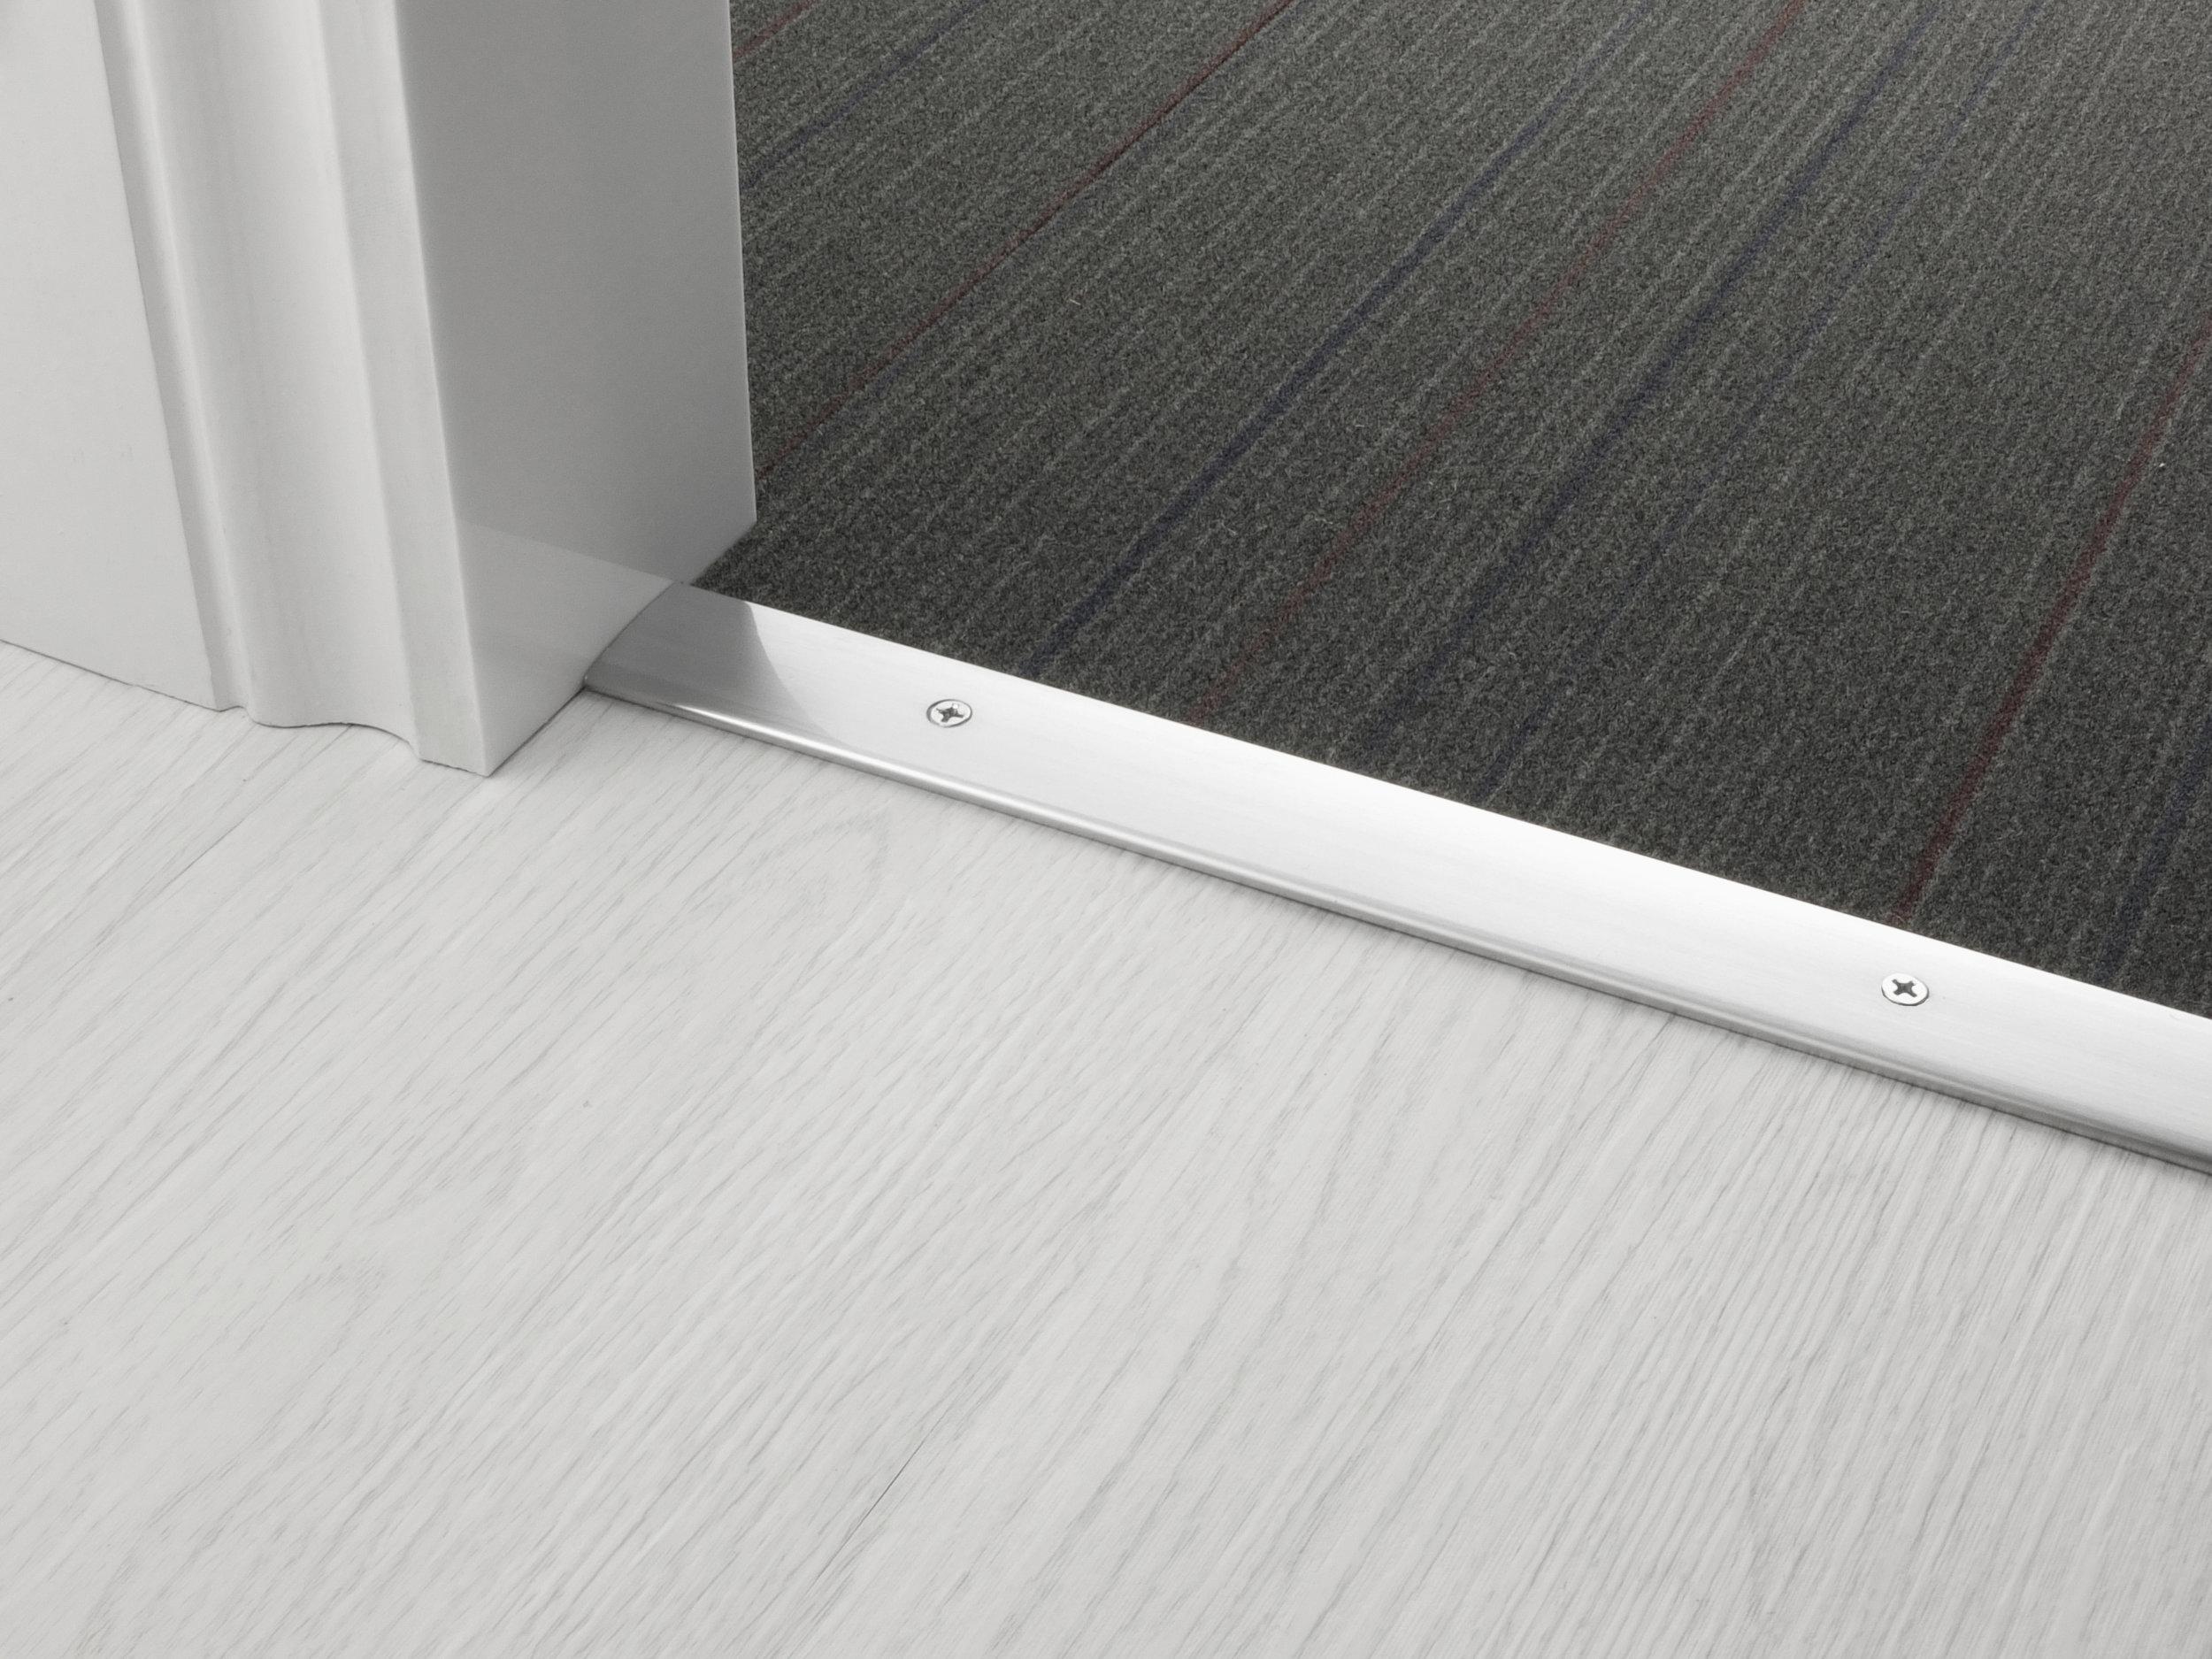 door_bar_cover-30mm_c2h_brushed_chrome.jpg